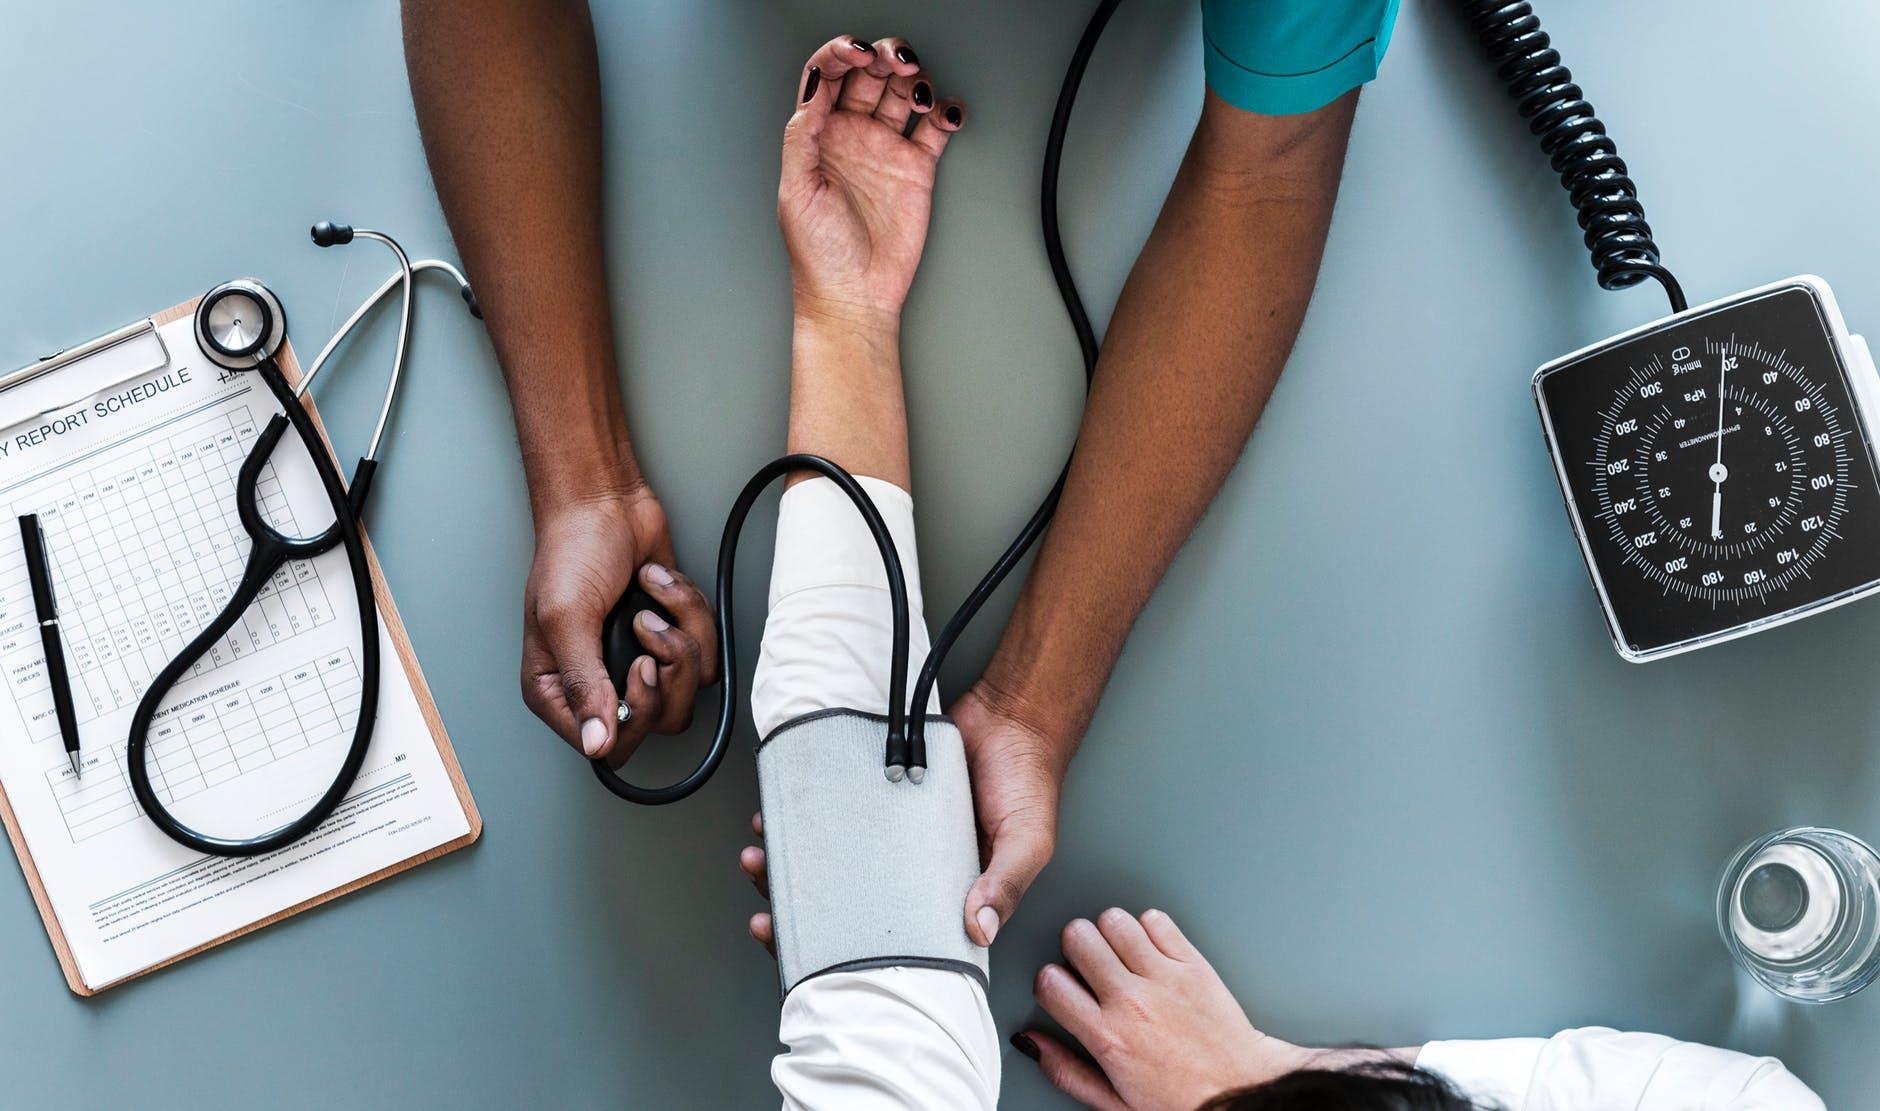 A nurse taking a patient's blood pressure.